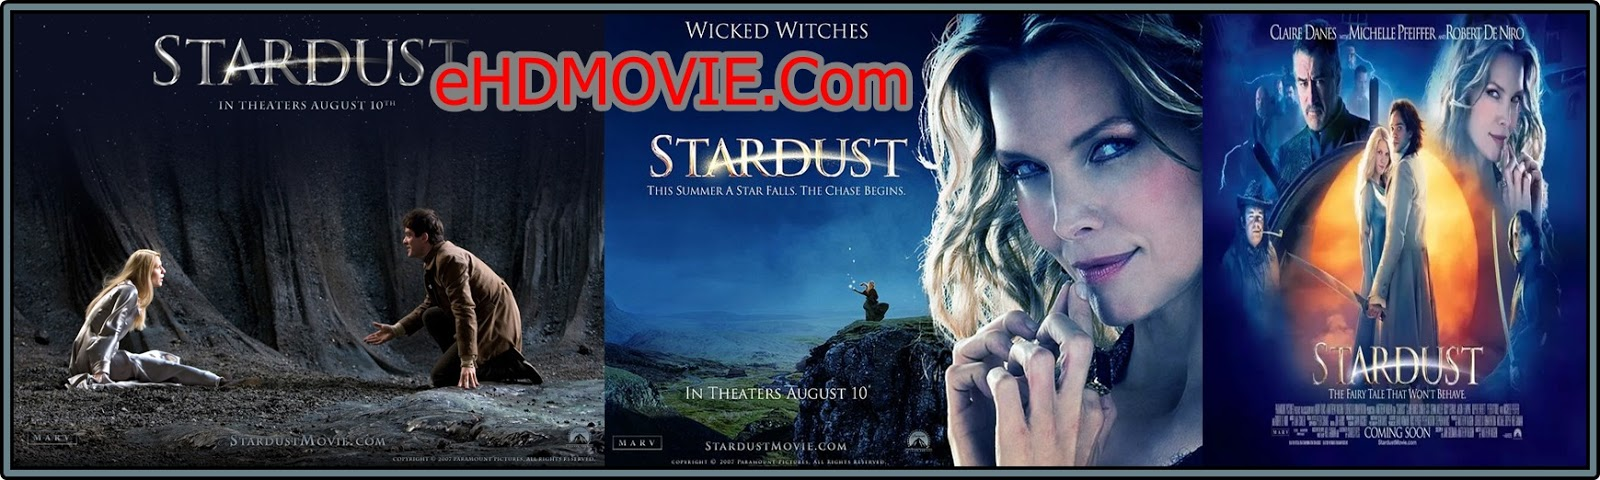 Stardust 2007 Full Movie Dual Audio [Hindi – English] 720p - 480p ORG BRRip 400MB - 1GB ESubs Free Download